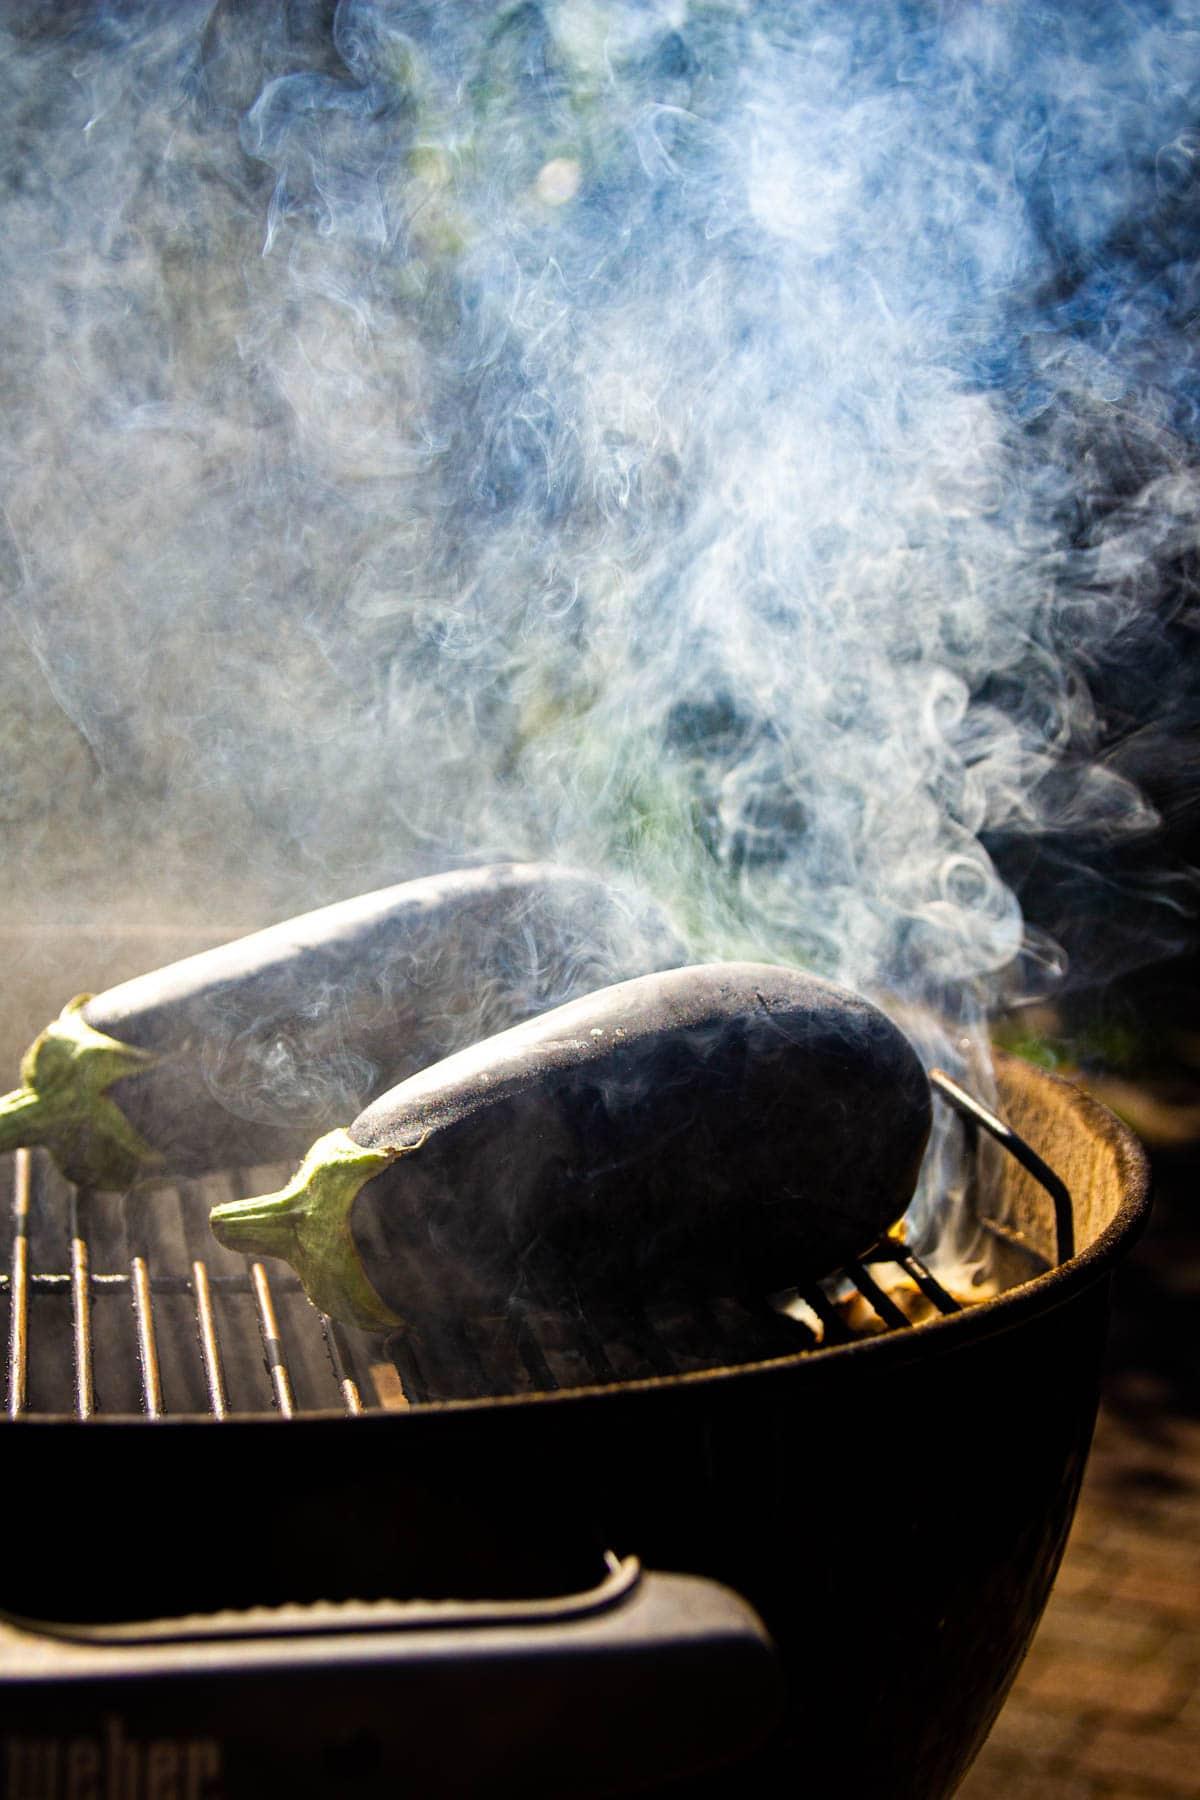 Eggplants smoking on the charcoal grill.